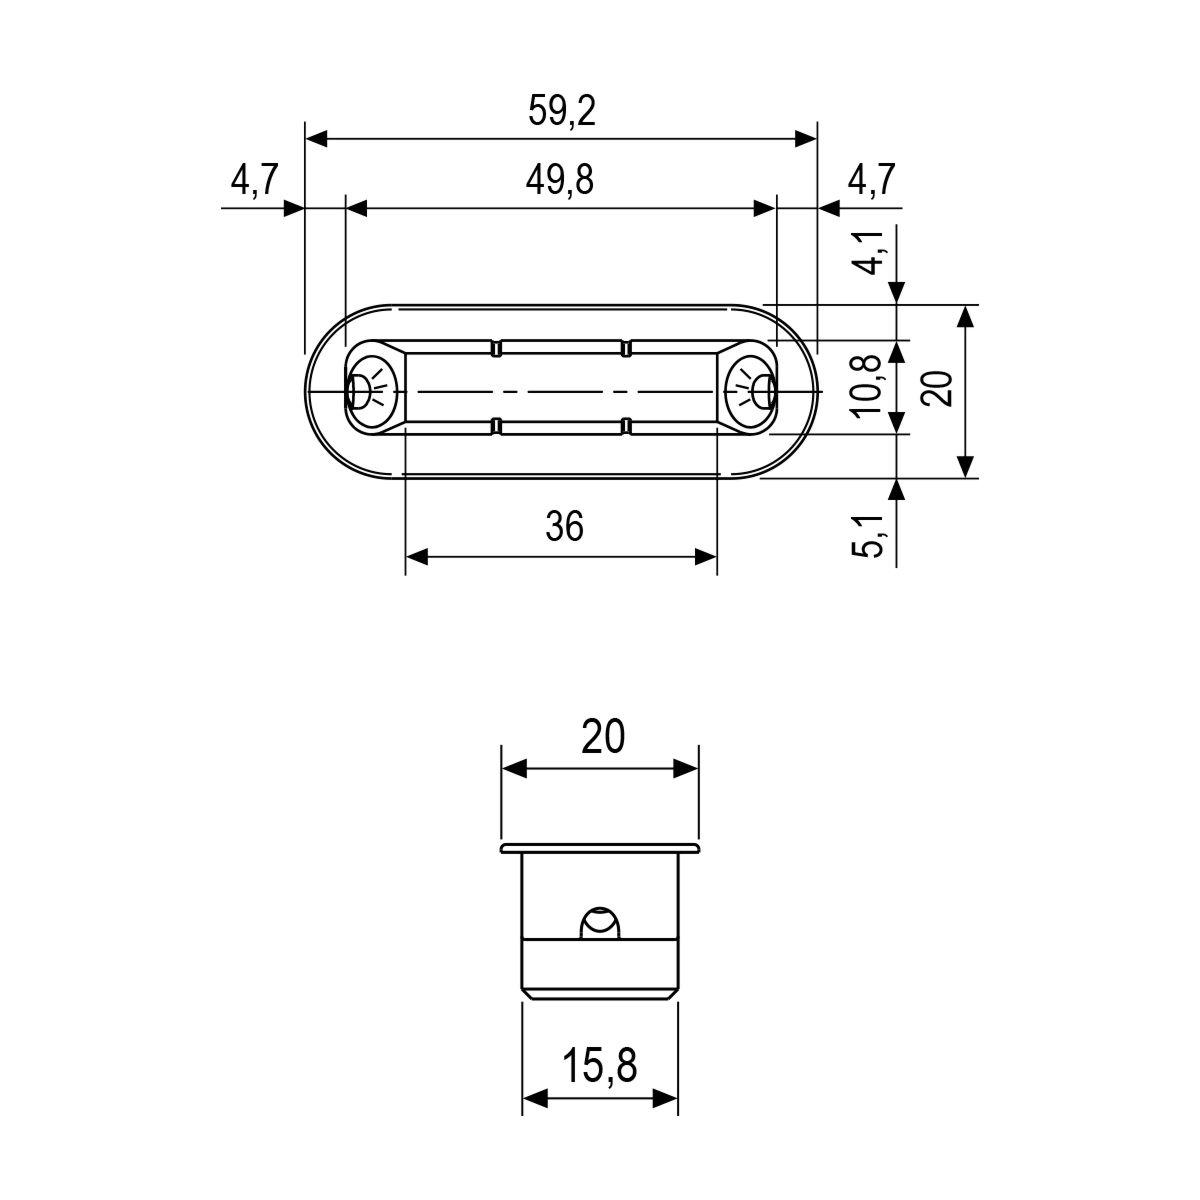 REVOLUTION XT - Picaporte magnético completo de muletilla